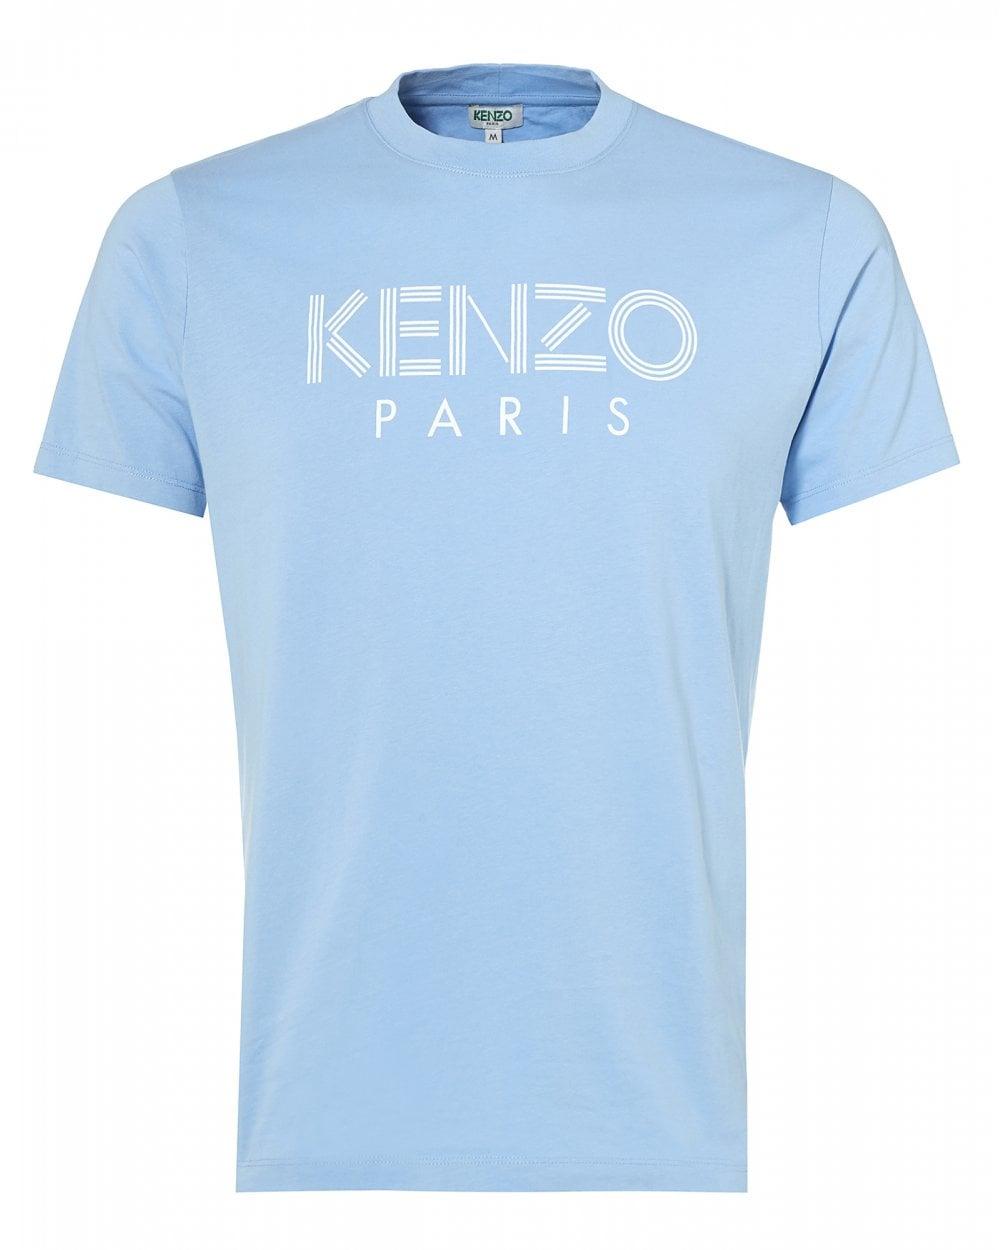 3cce92c1 Kenzo Mens Classic Logo T-Shirt, Sky Blue Tee